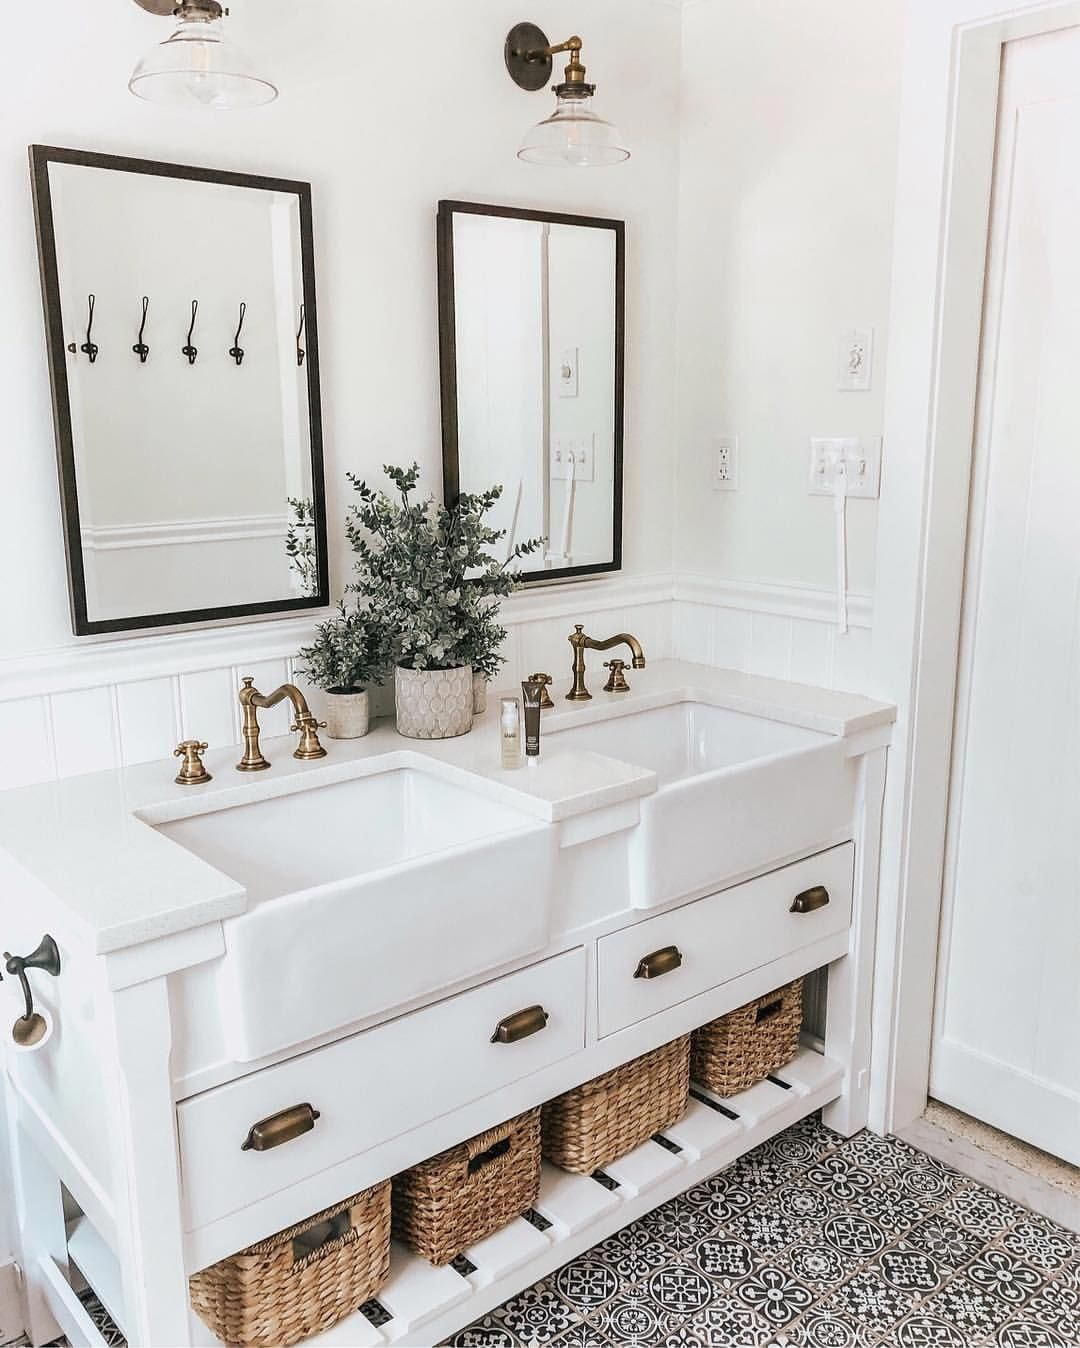 Bathroom Sinks And Taps Bathroomlayout Farmhouse Bathroom Decor Bathroom Decor Bathrooms Remodel